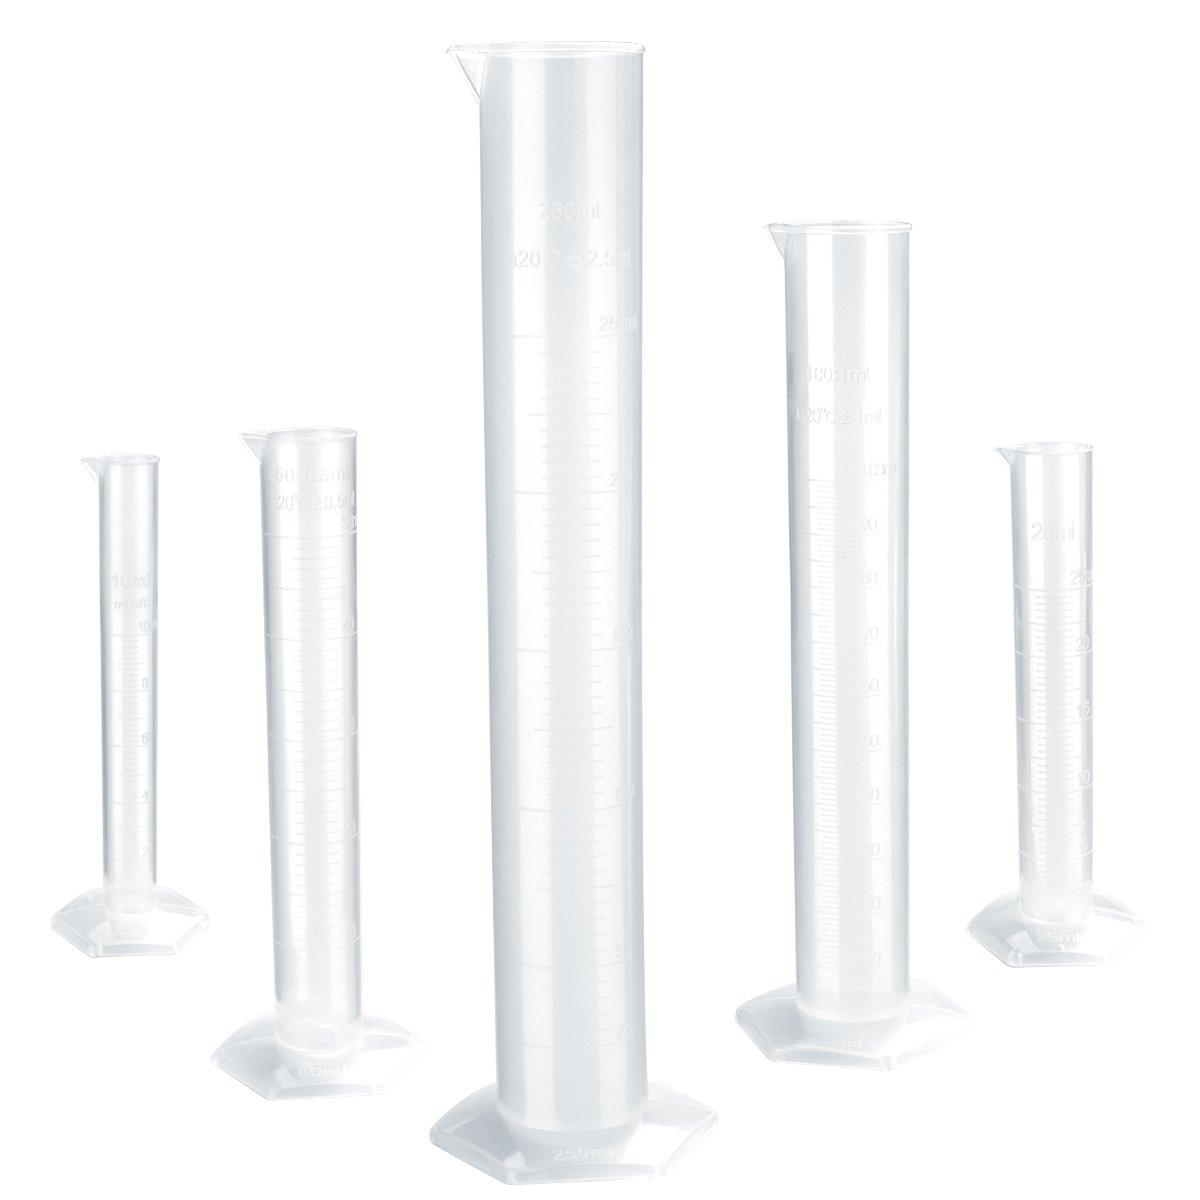 UEETEK Cilindro Graduado Laboratorio Probeta Plástico Transparente 10ml 25ml 50ml 100ml 250ml 5 Unidades